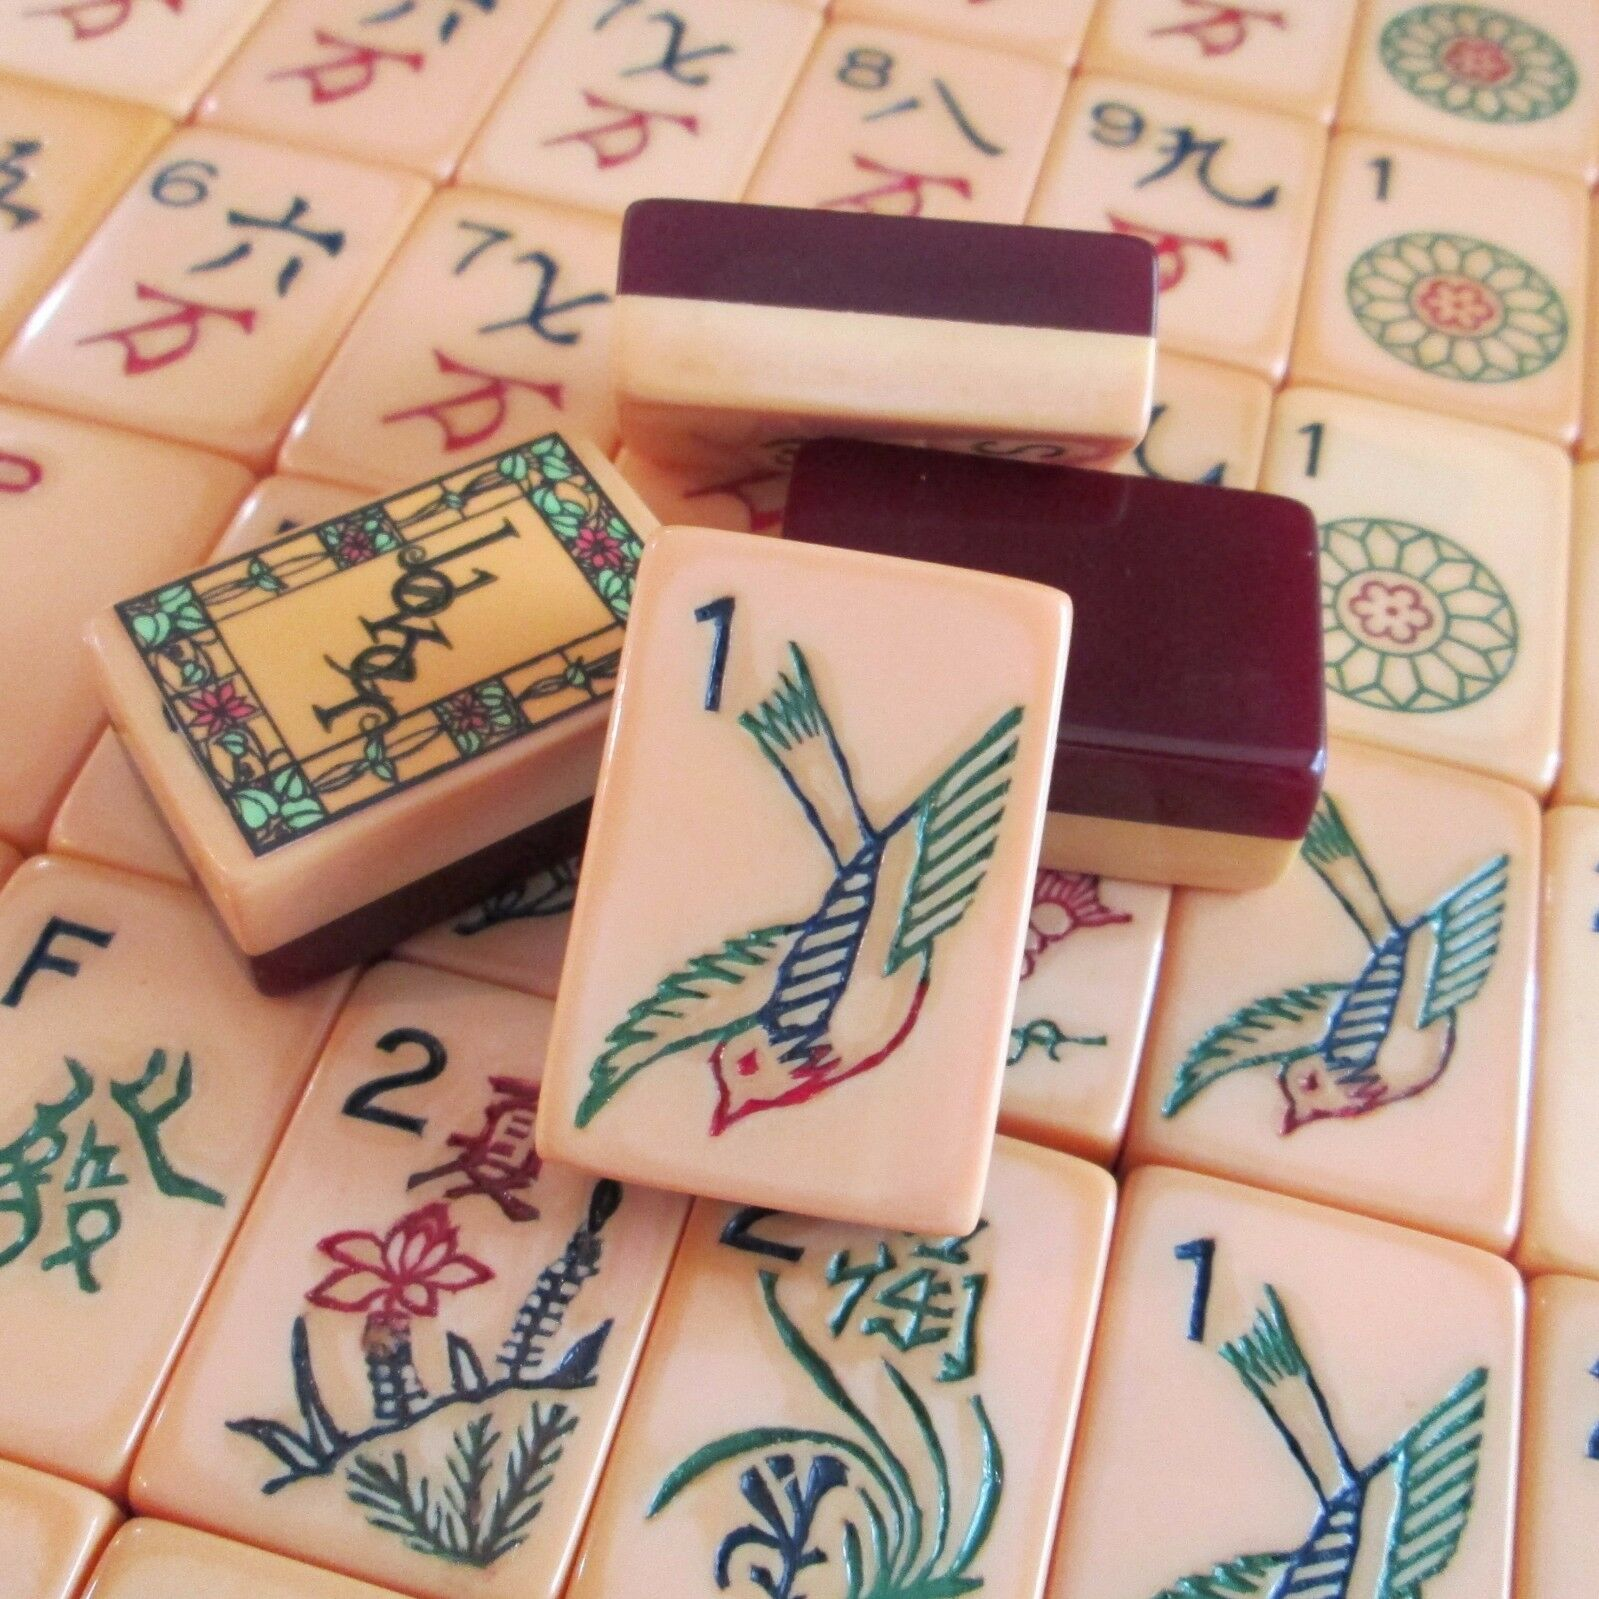 Vtg, Burgundy Two Two Two Tone 152 Tiles Mahjong Set Catalin Mah Jongg Ivorycraft color 6c368b